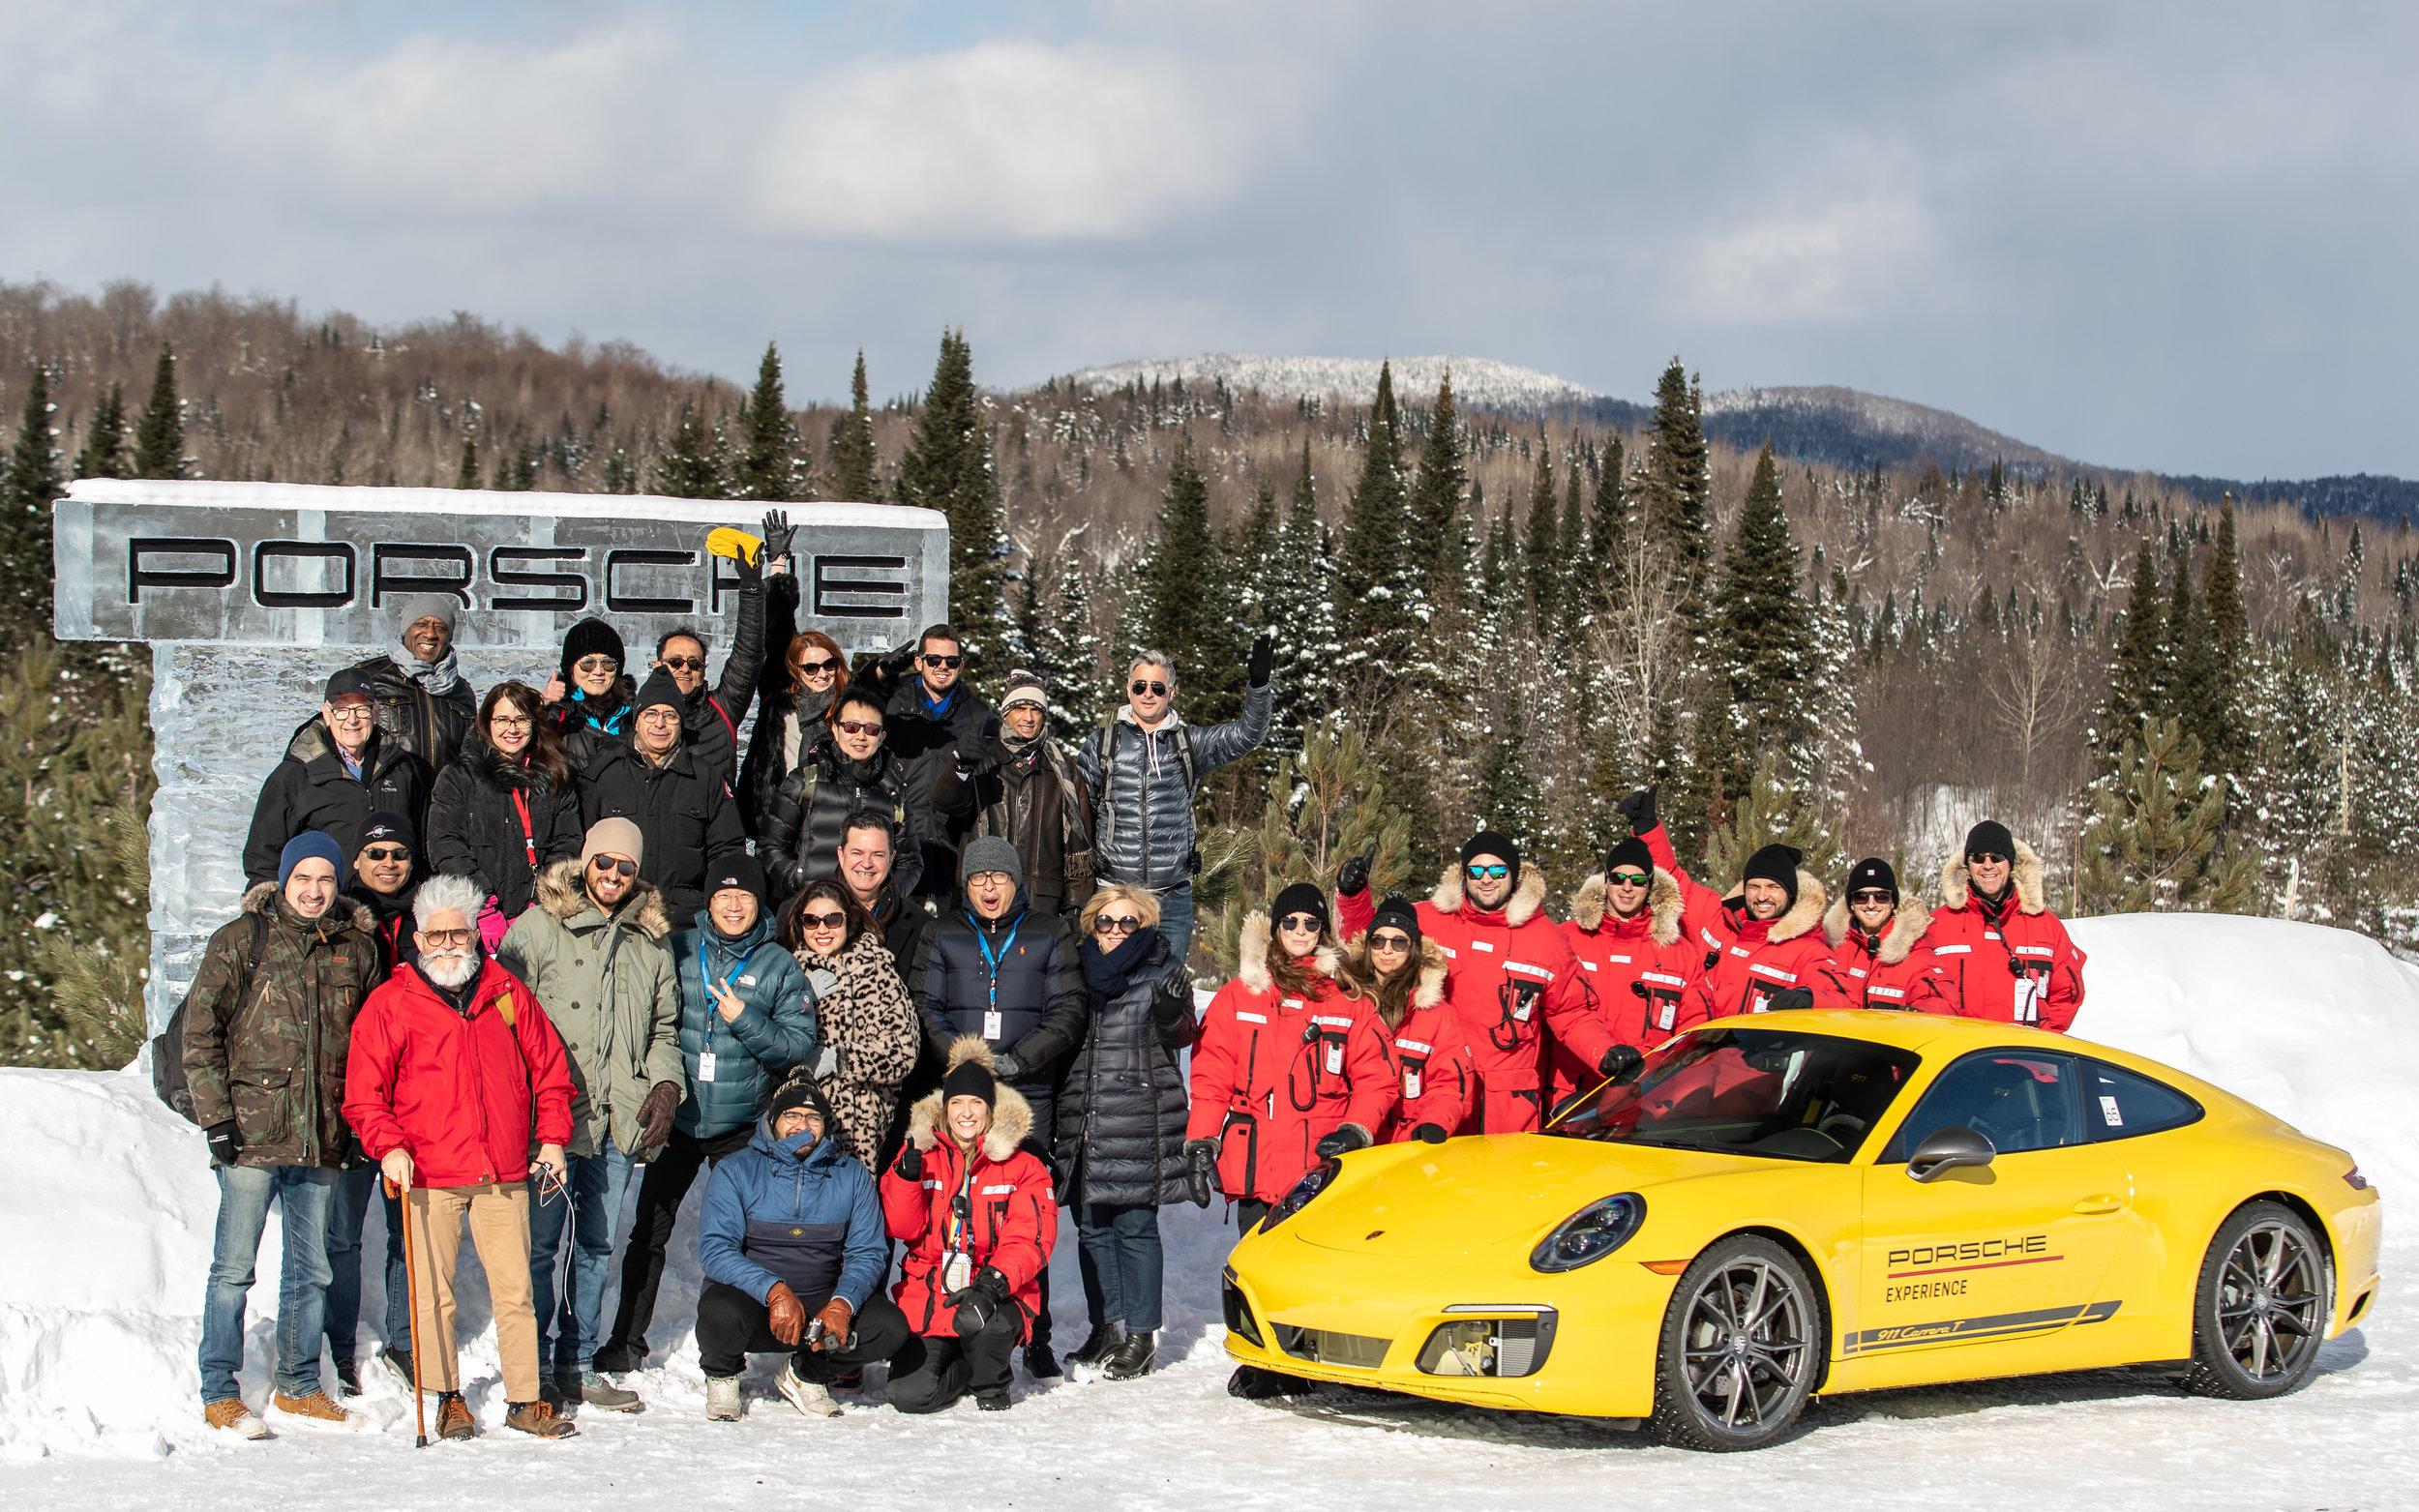 Porsche-Ice-Experience-Canada-Media-129.jpg